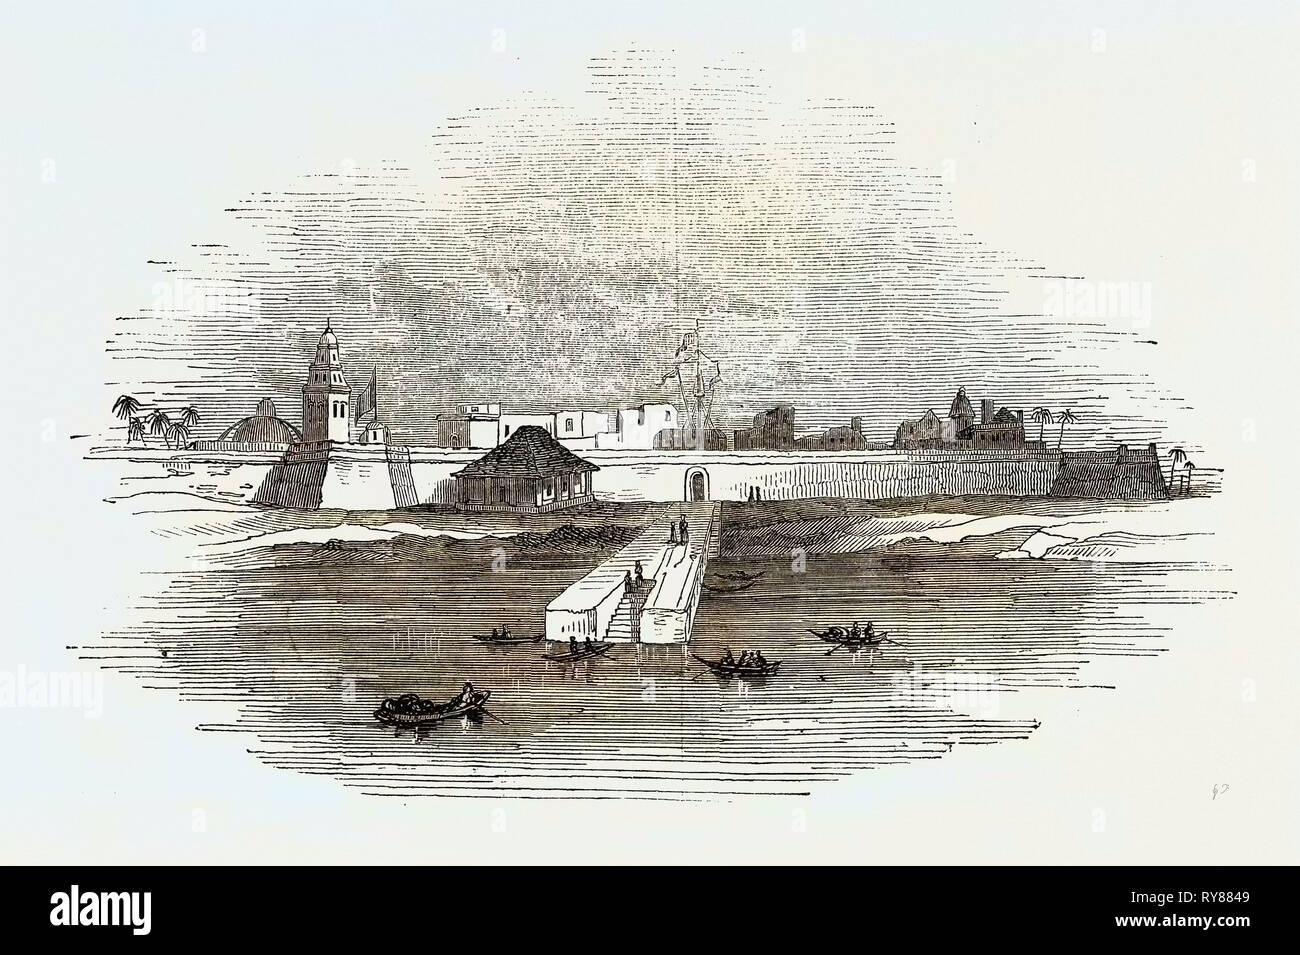 Campeachy - Stock Image